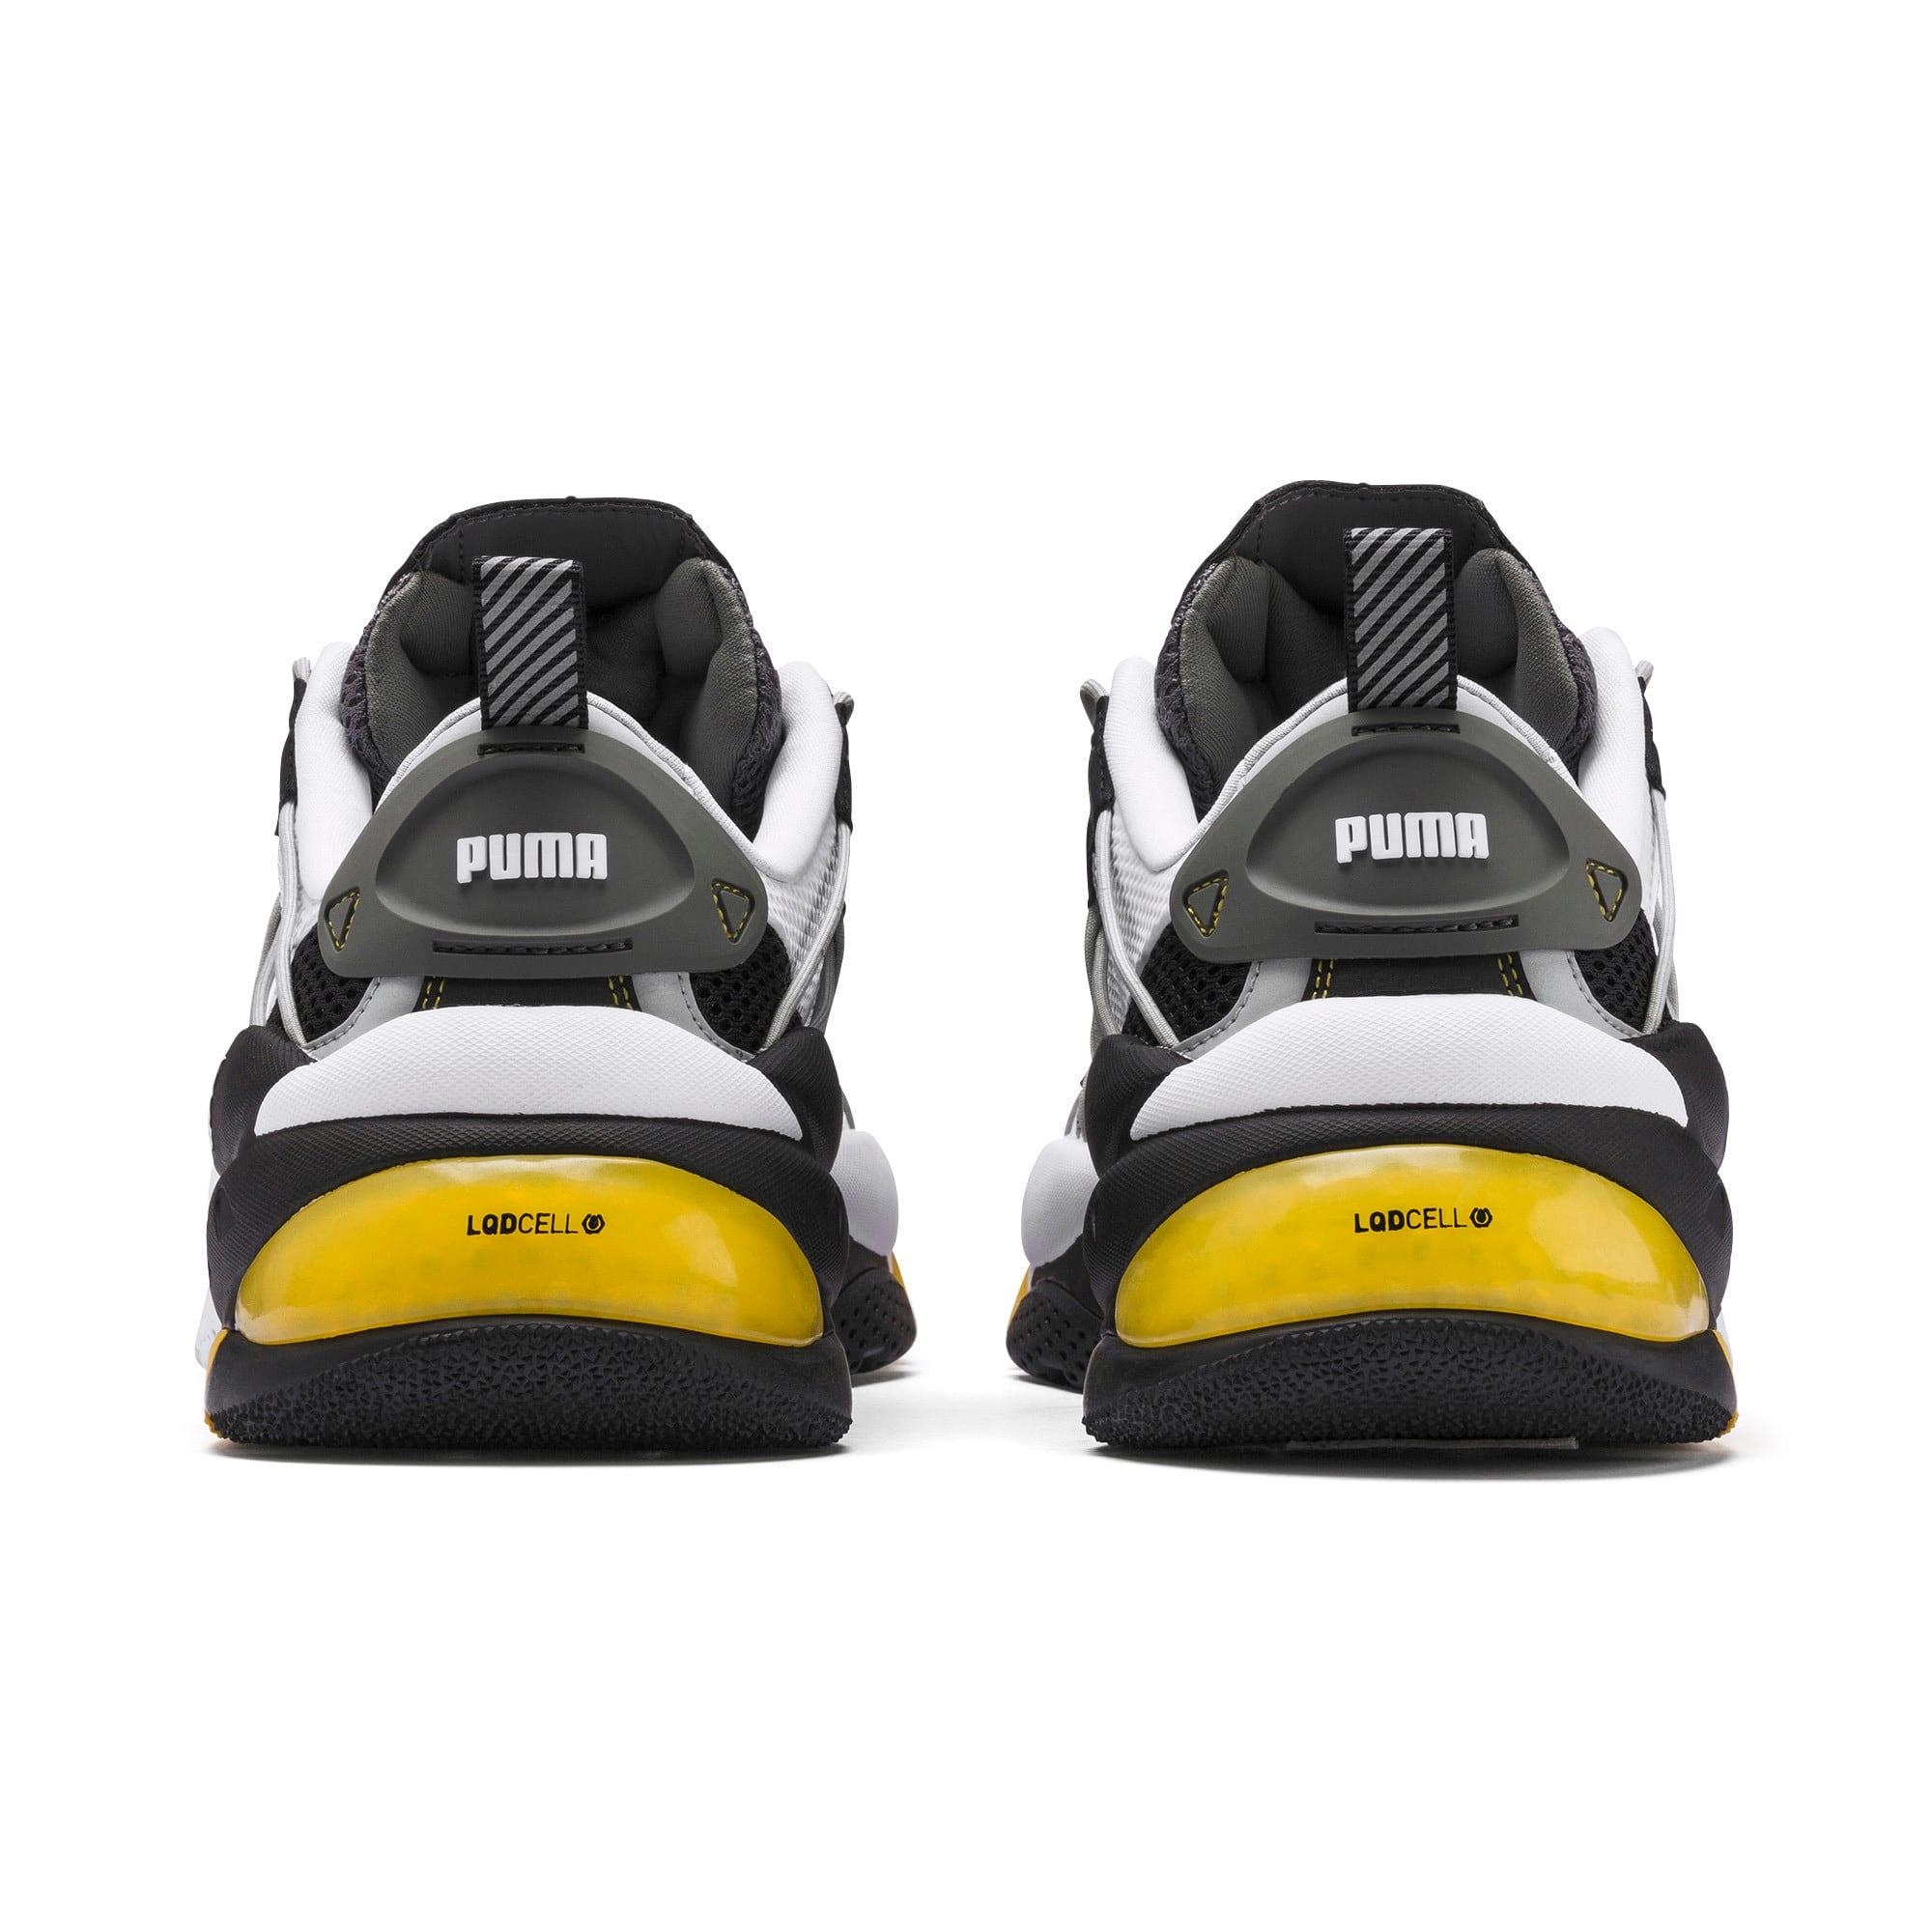 Thumbnail 3 of LQDCELL Omega Training Shoes, Puma Black-CASTLEROCK, medium